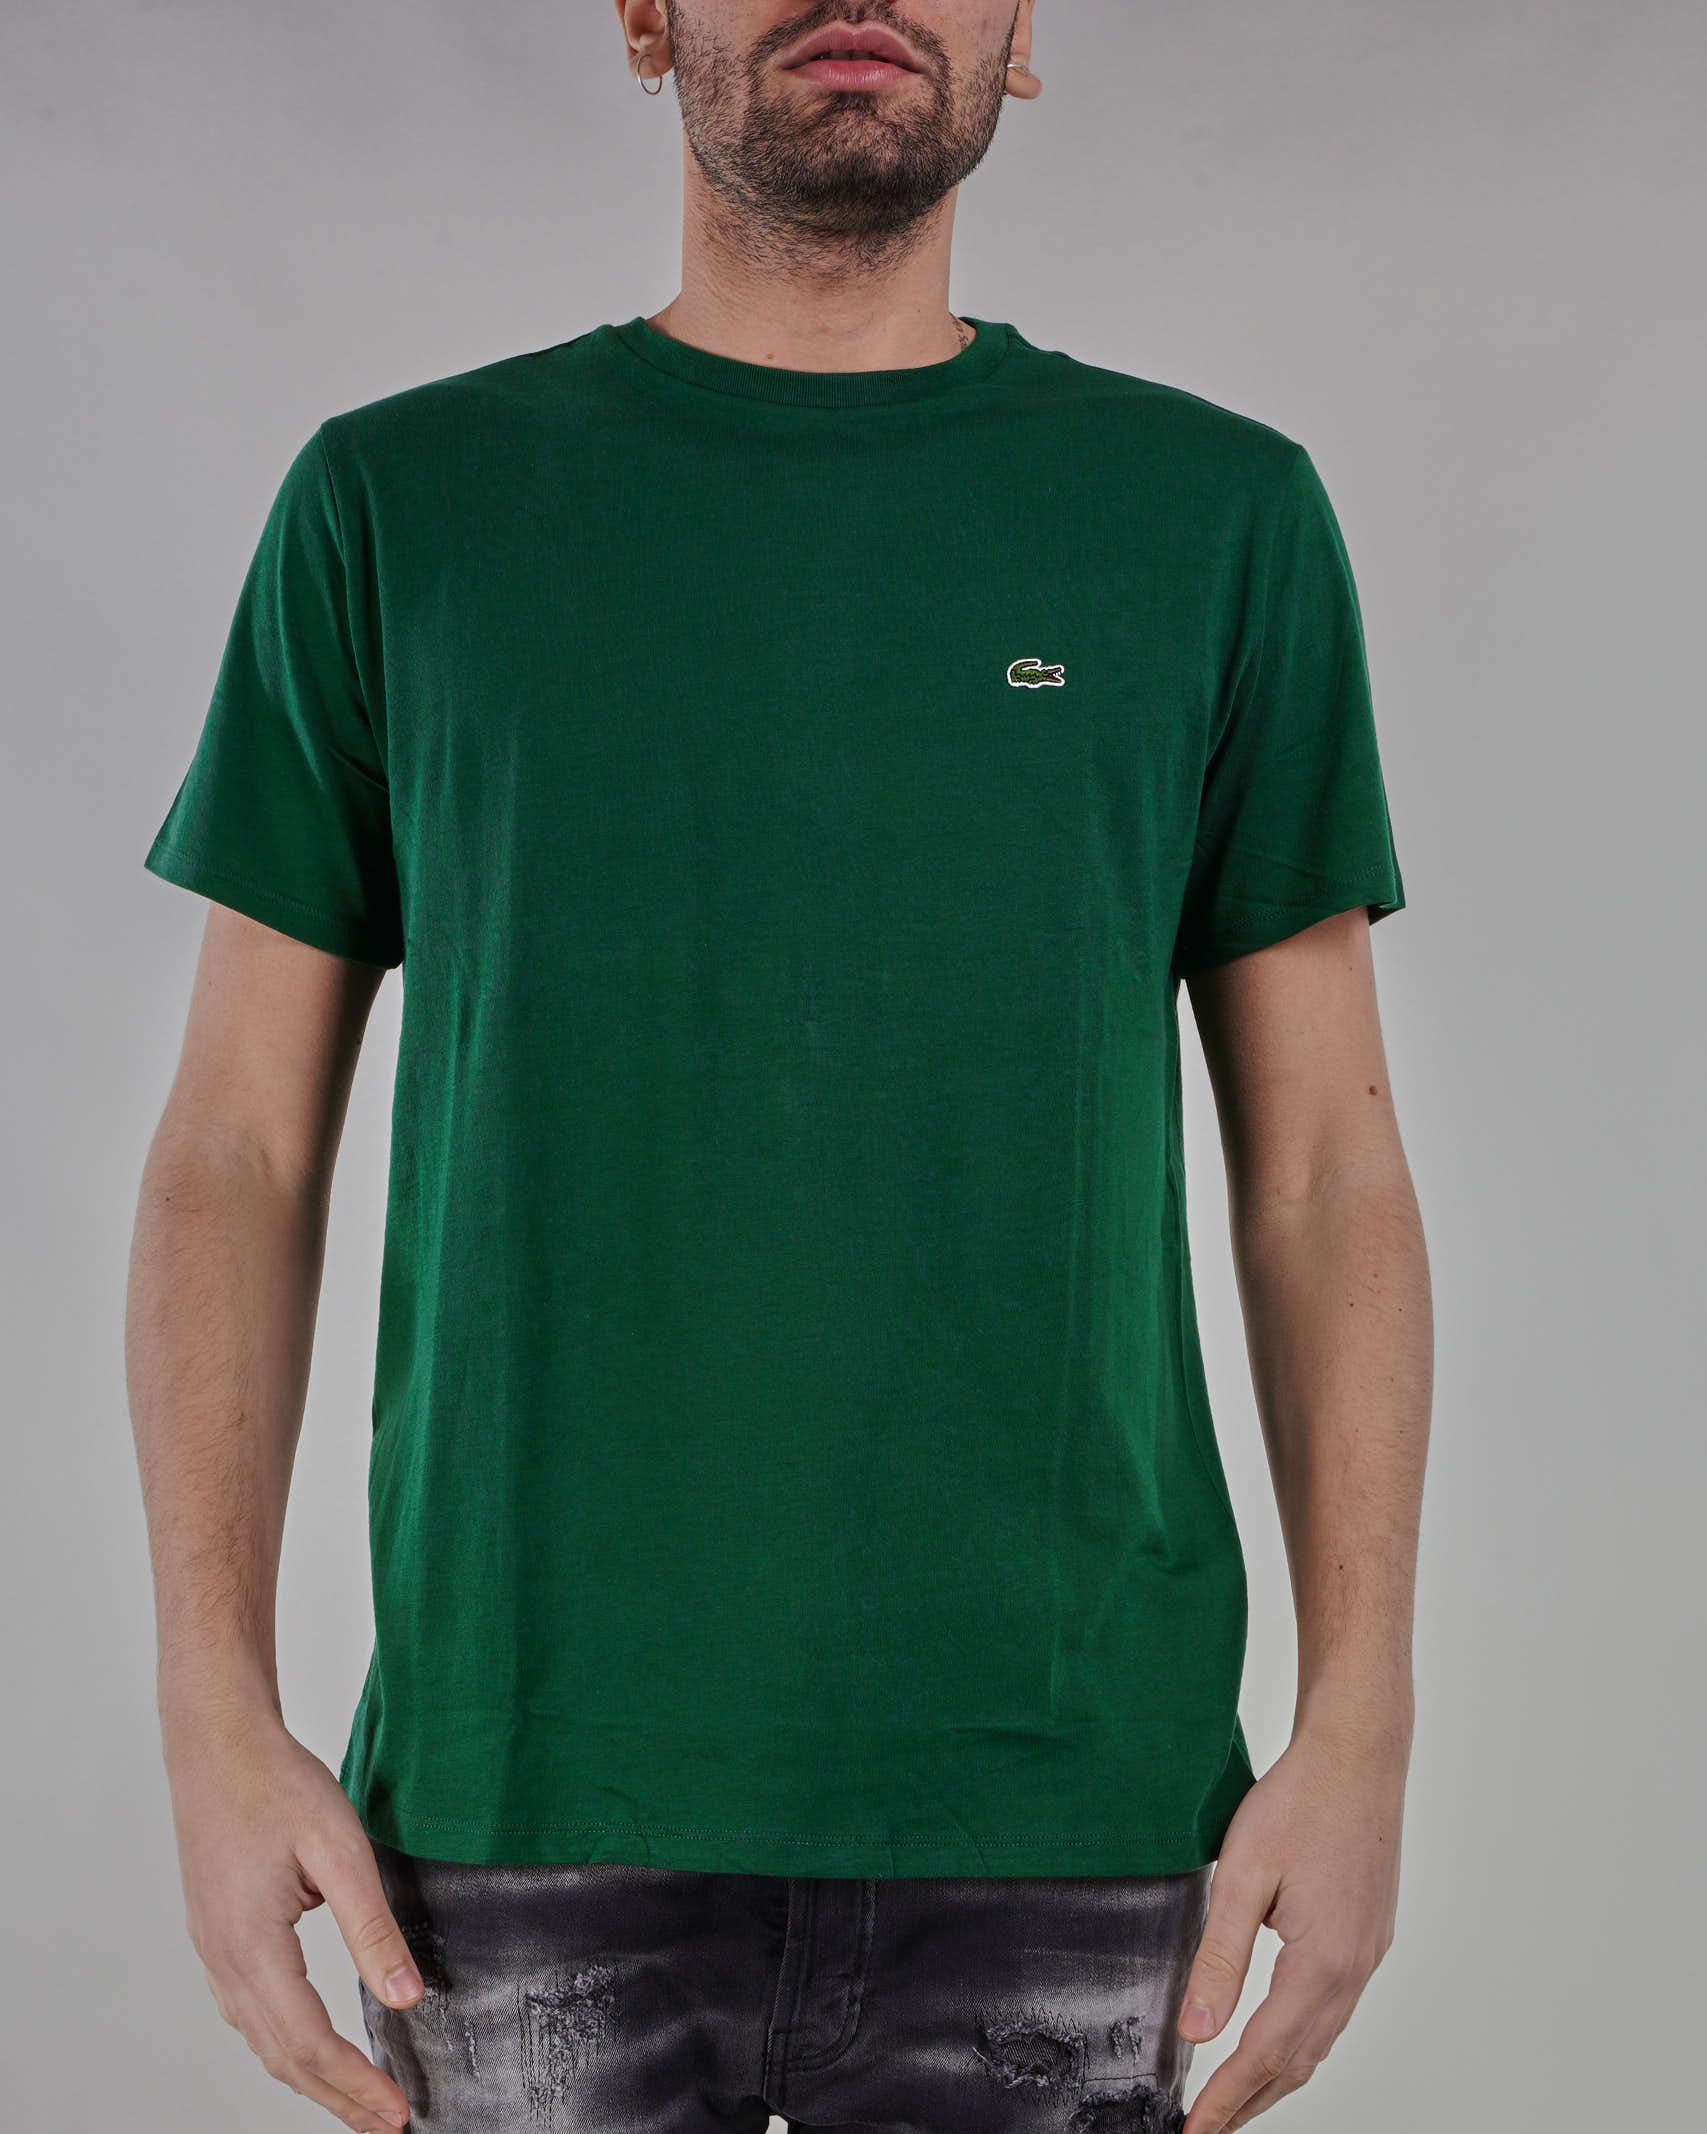 T-shirt in jersey di cotone Pima Lacoste LACOSTE | T-shirt | TH6709132